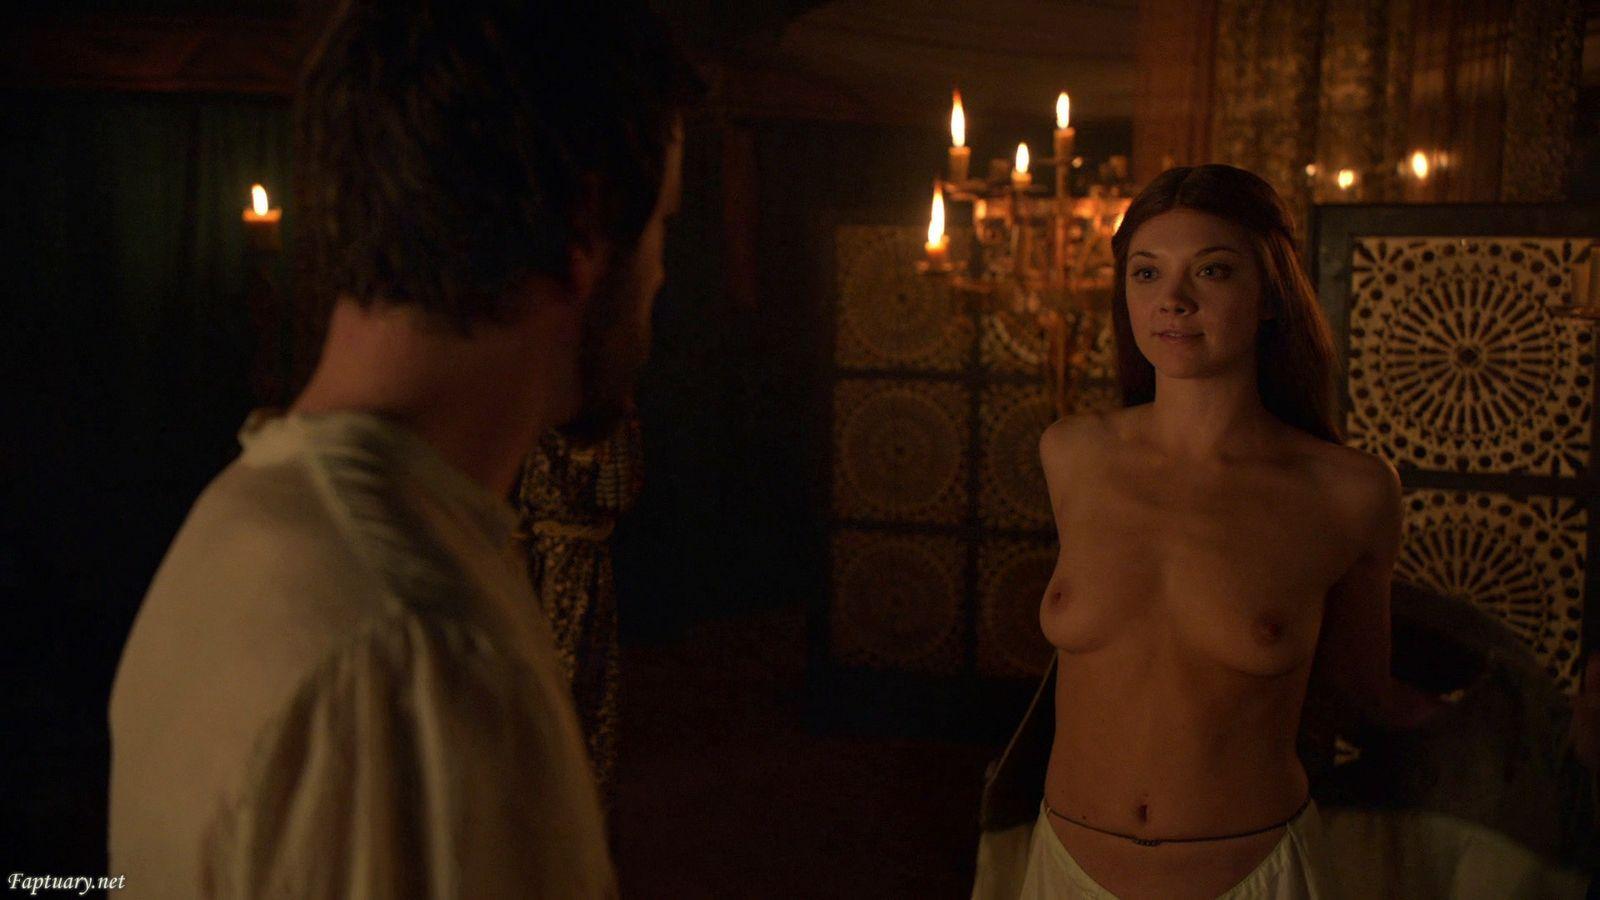 Sexy nude girl sex gif